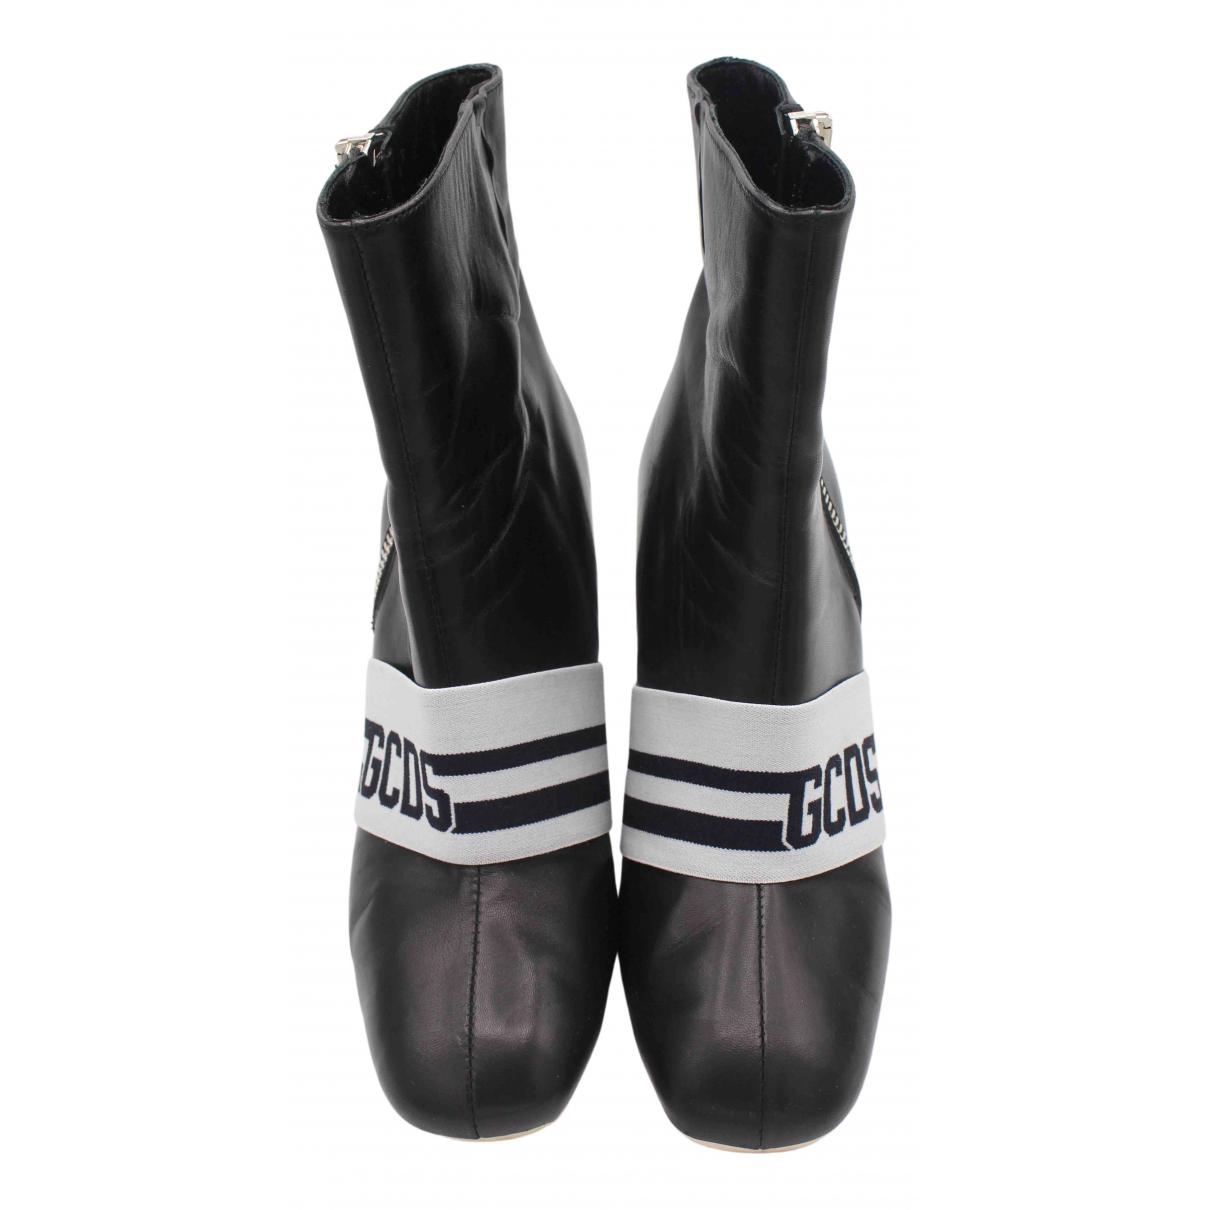 Gcds N Black Leather Boots for Women 41 EU